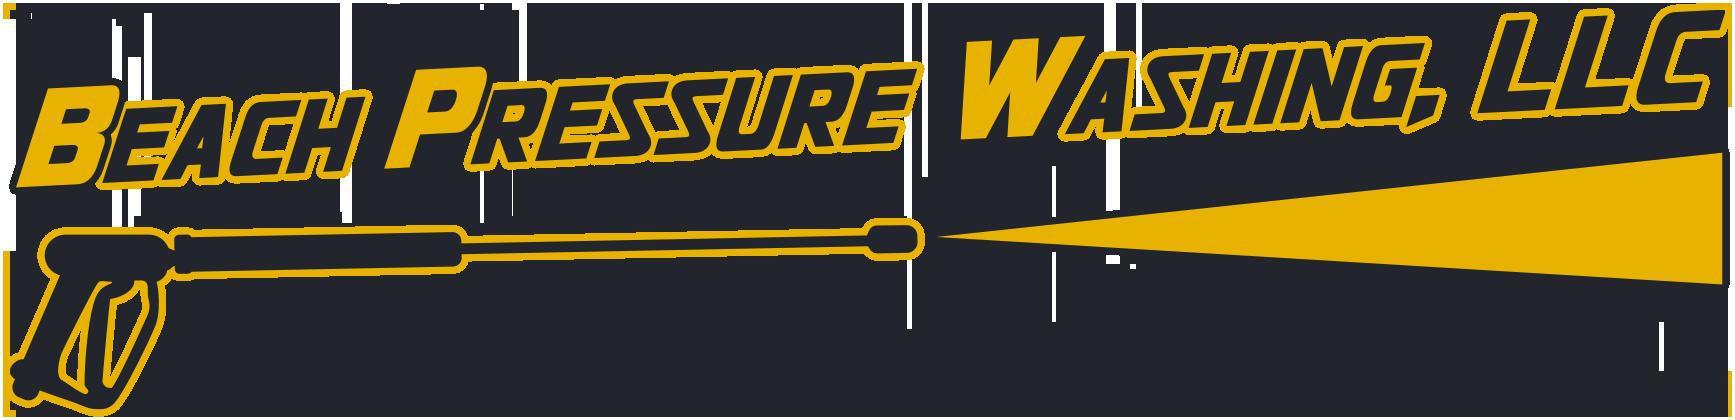 Beach Pressure Washing Logo